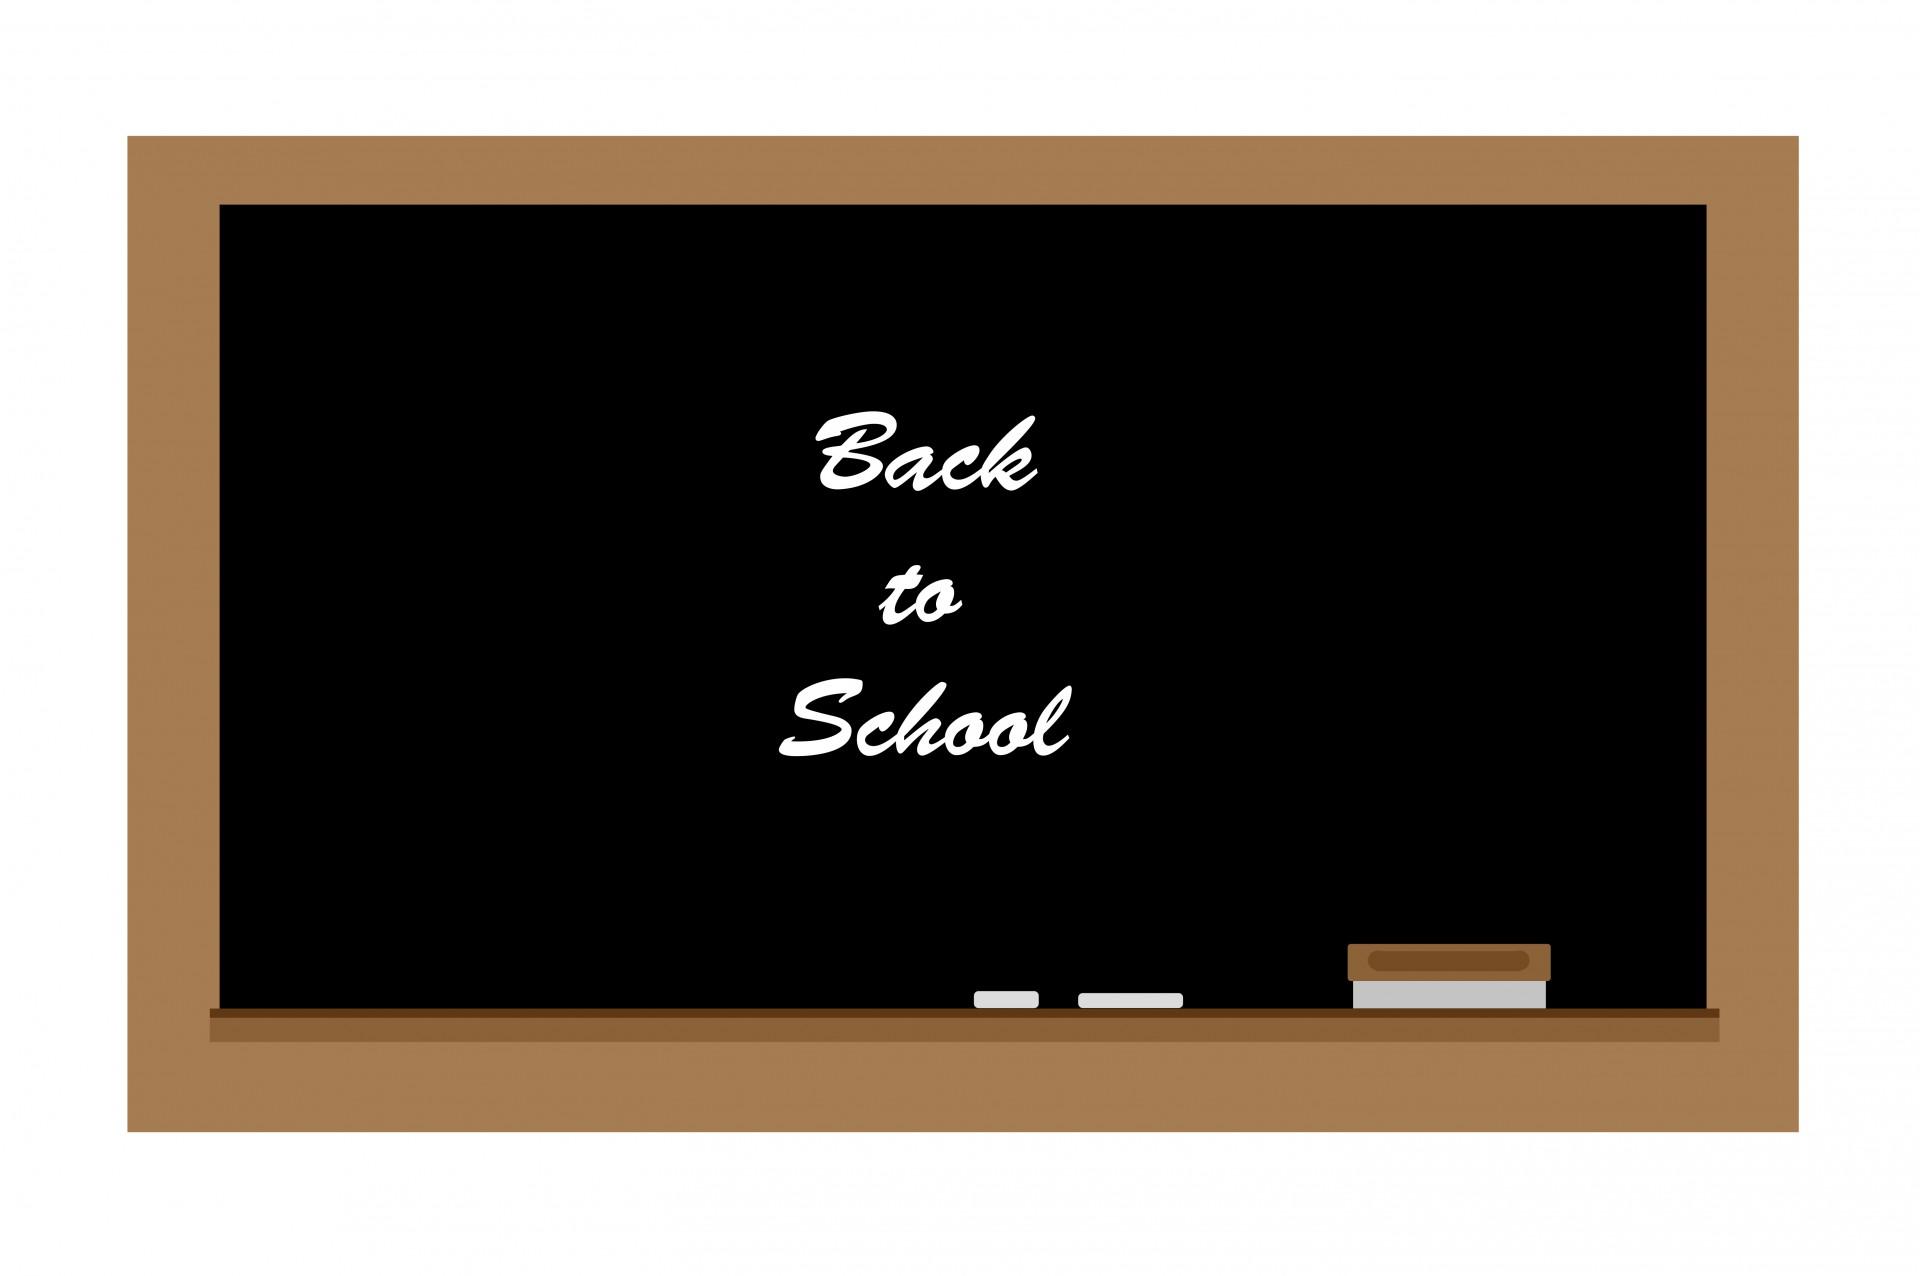 Chalk clipart school. Chalkboard free stock photo